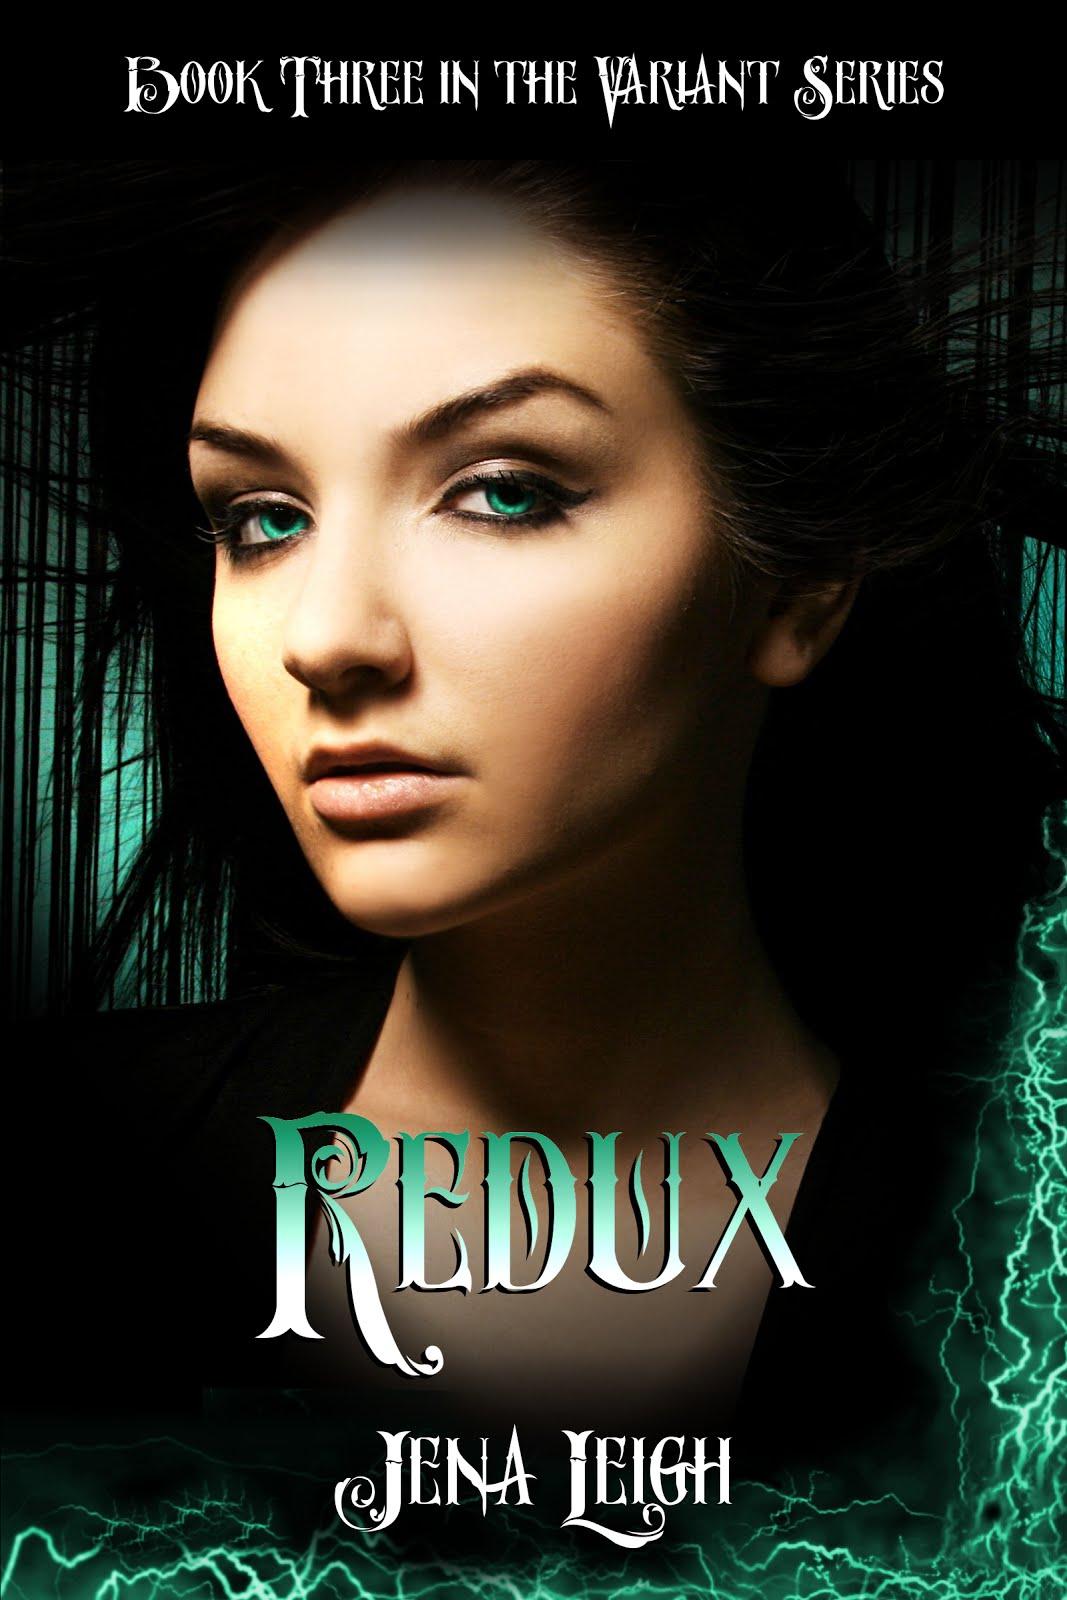 Find Redux on Amazon